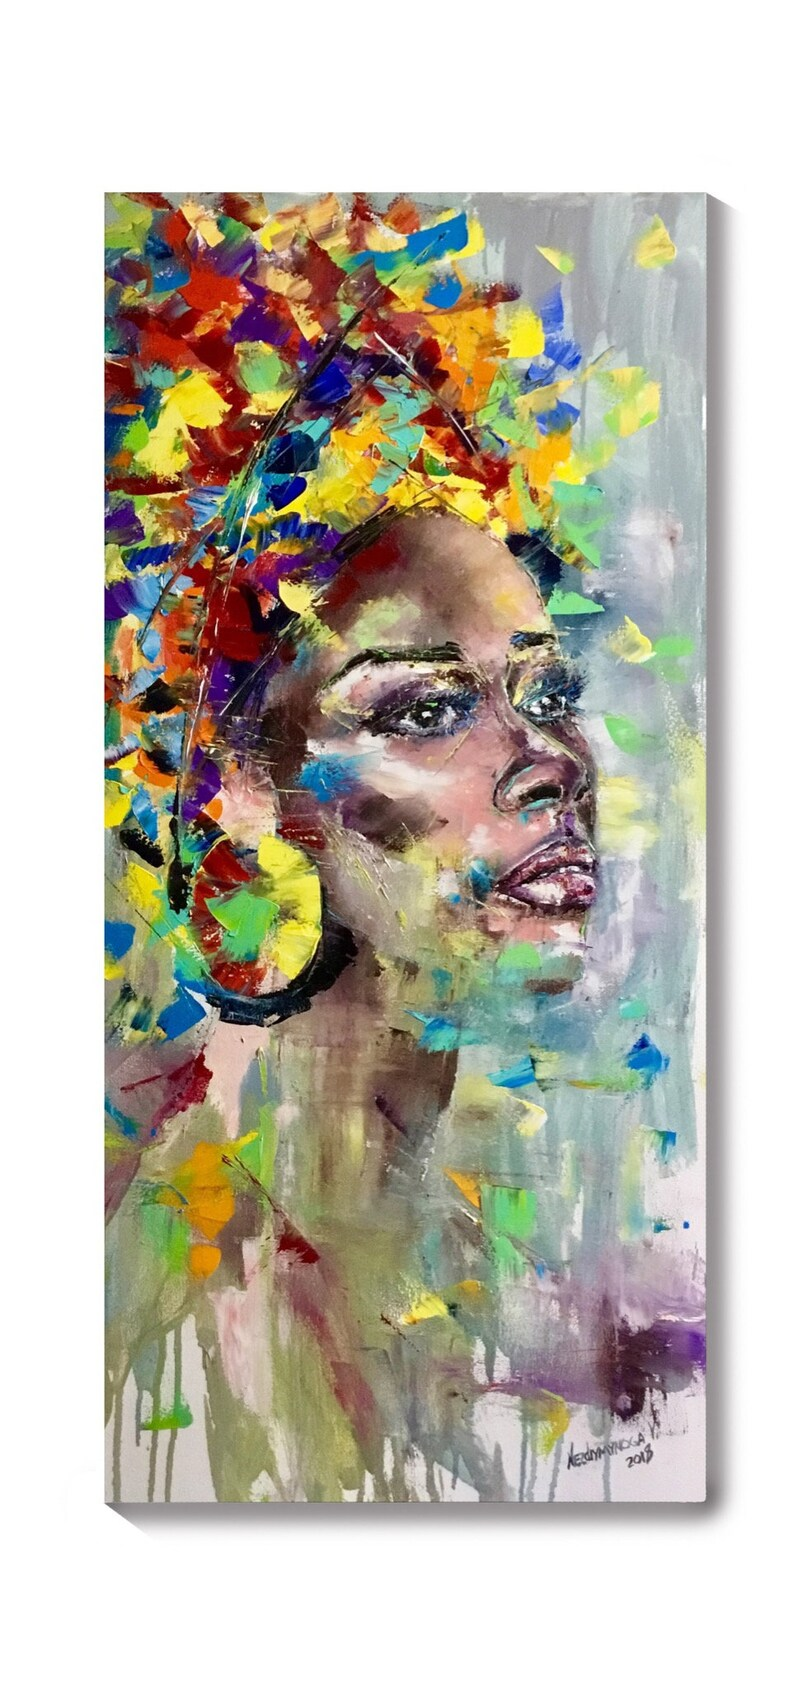 Voorkeur Afrikaanse vrouwen portret op canvas Afrikaanse schilderij | Etsy @SS19